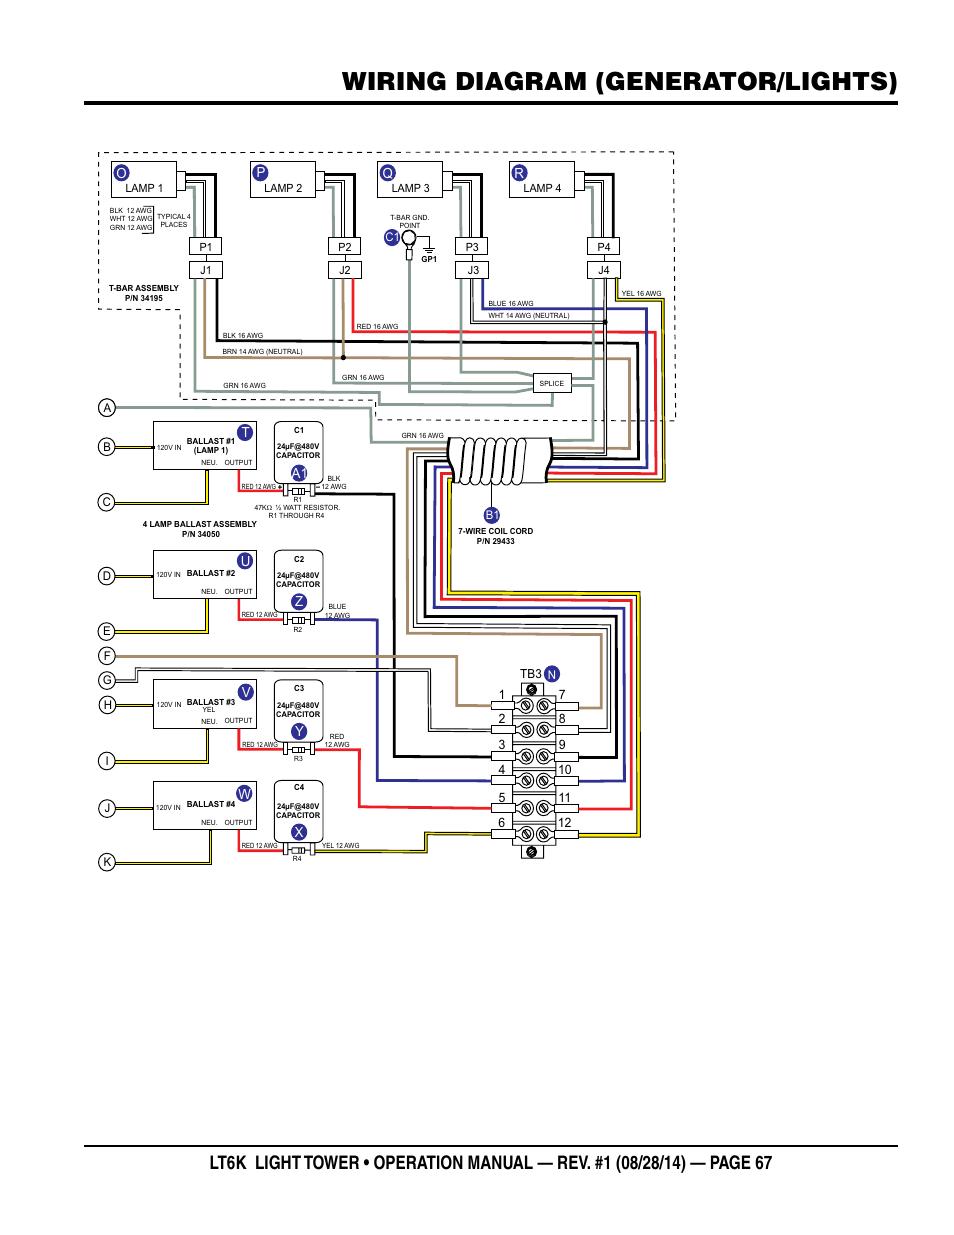 Wiring Diagram  Generator  Lights   Tu V W A1 Z